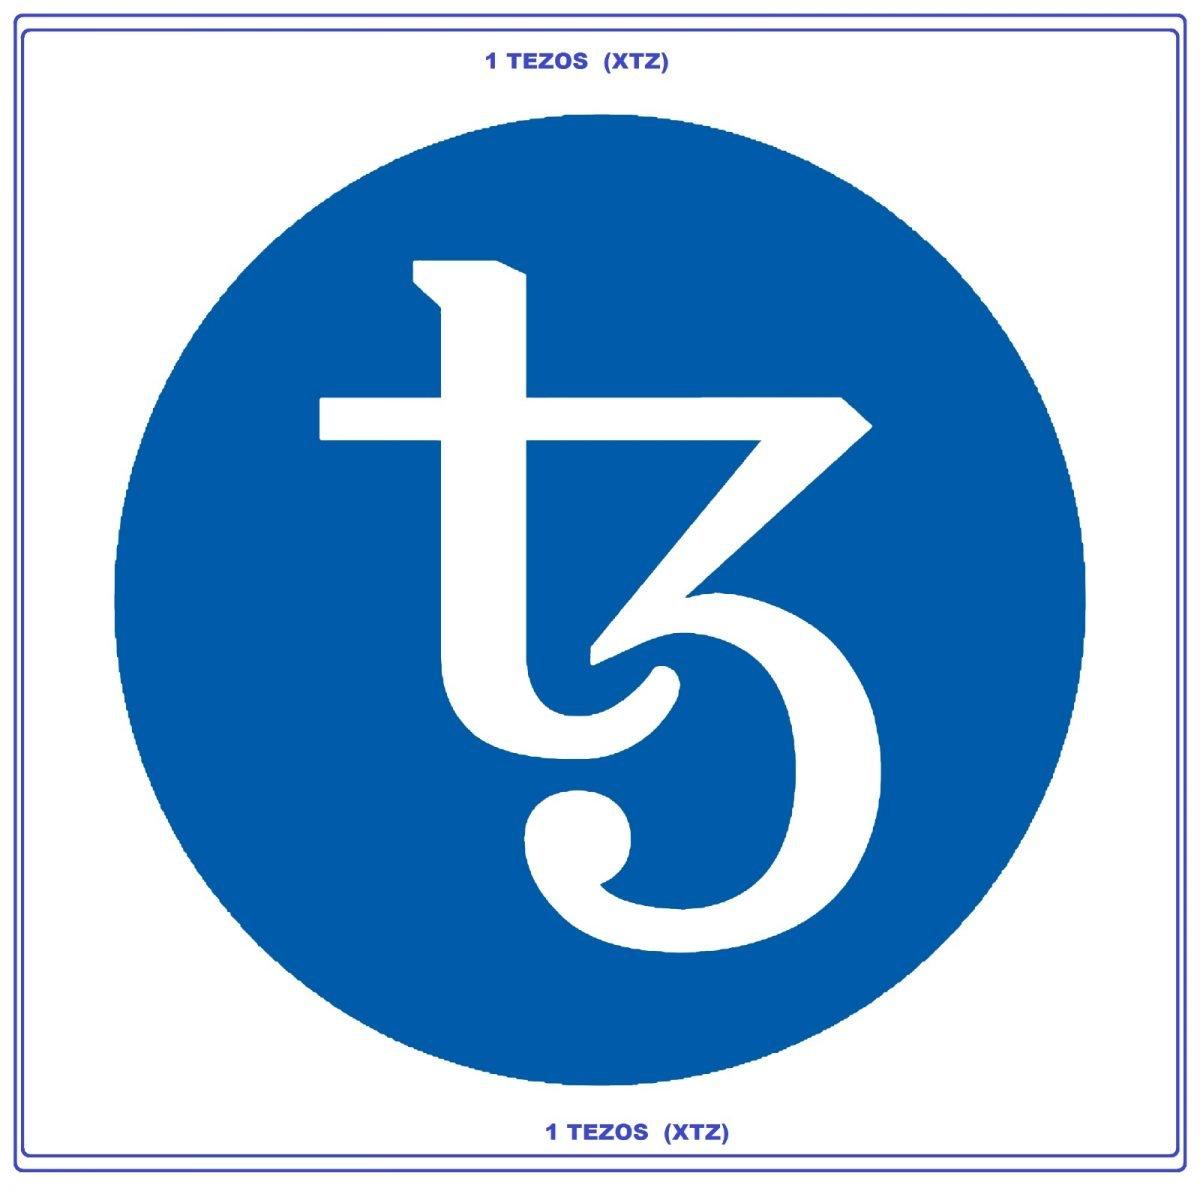 TEZOS web services